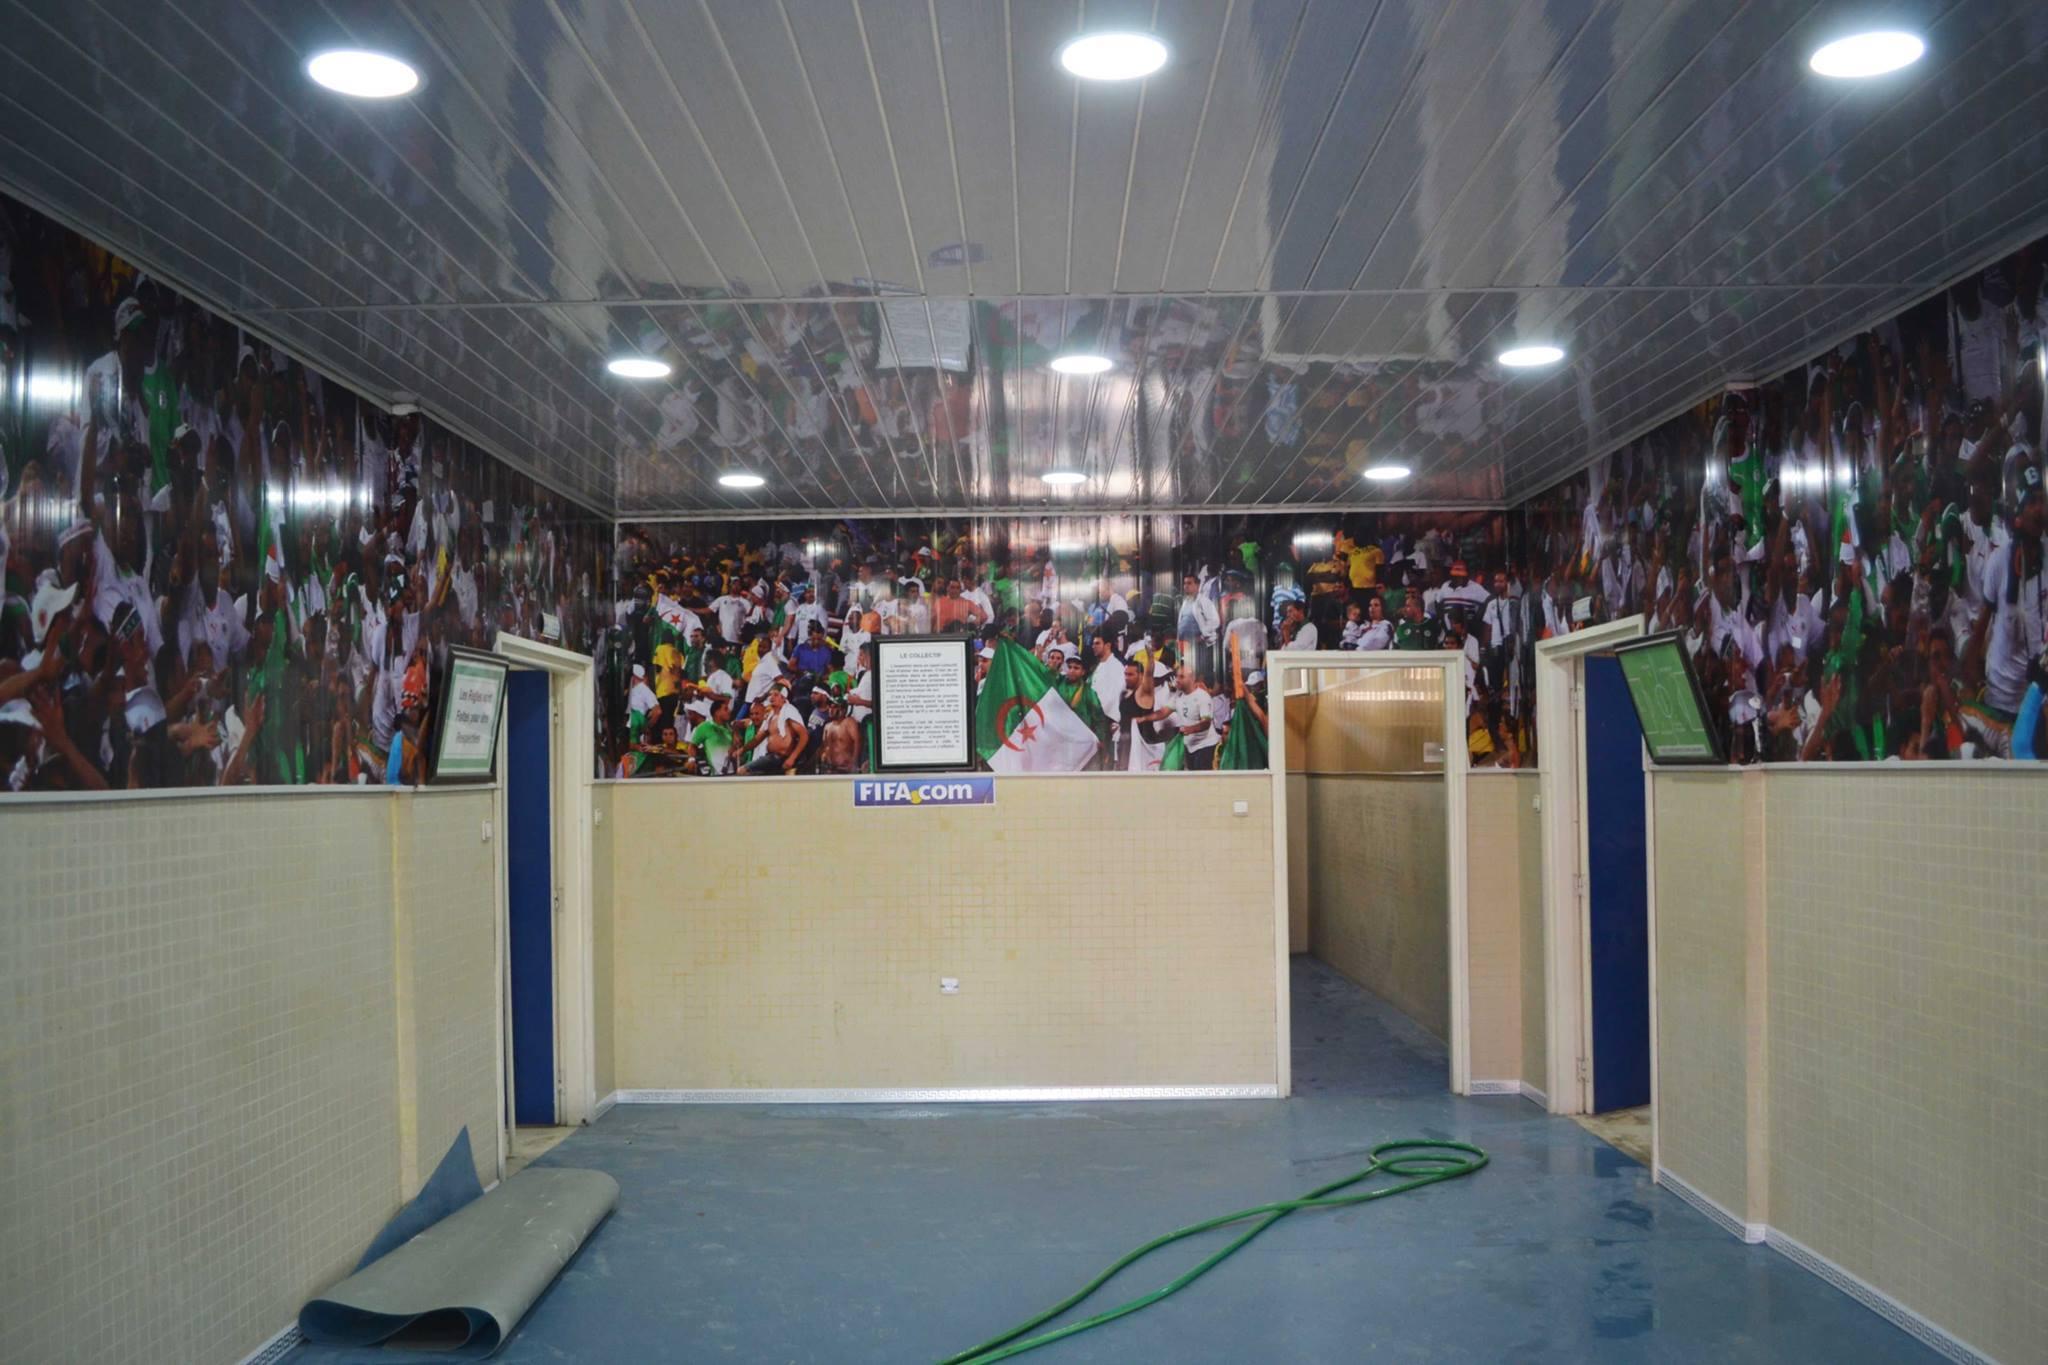 visite-stade-tchaker-interieur-jpg